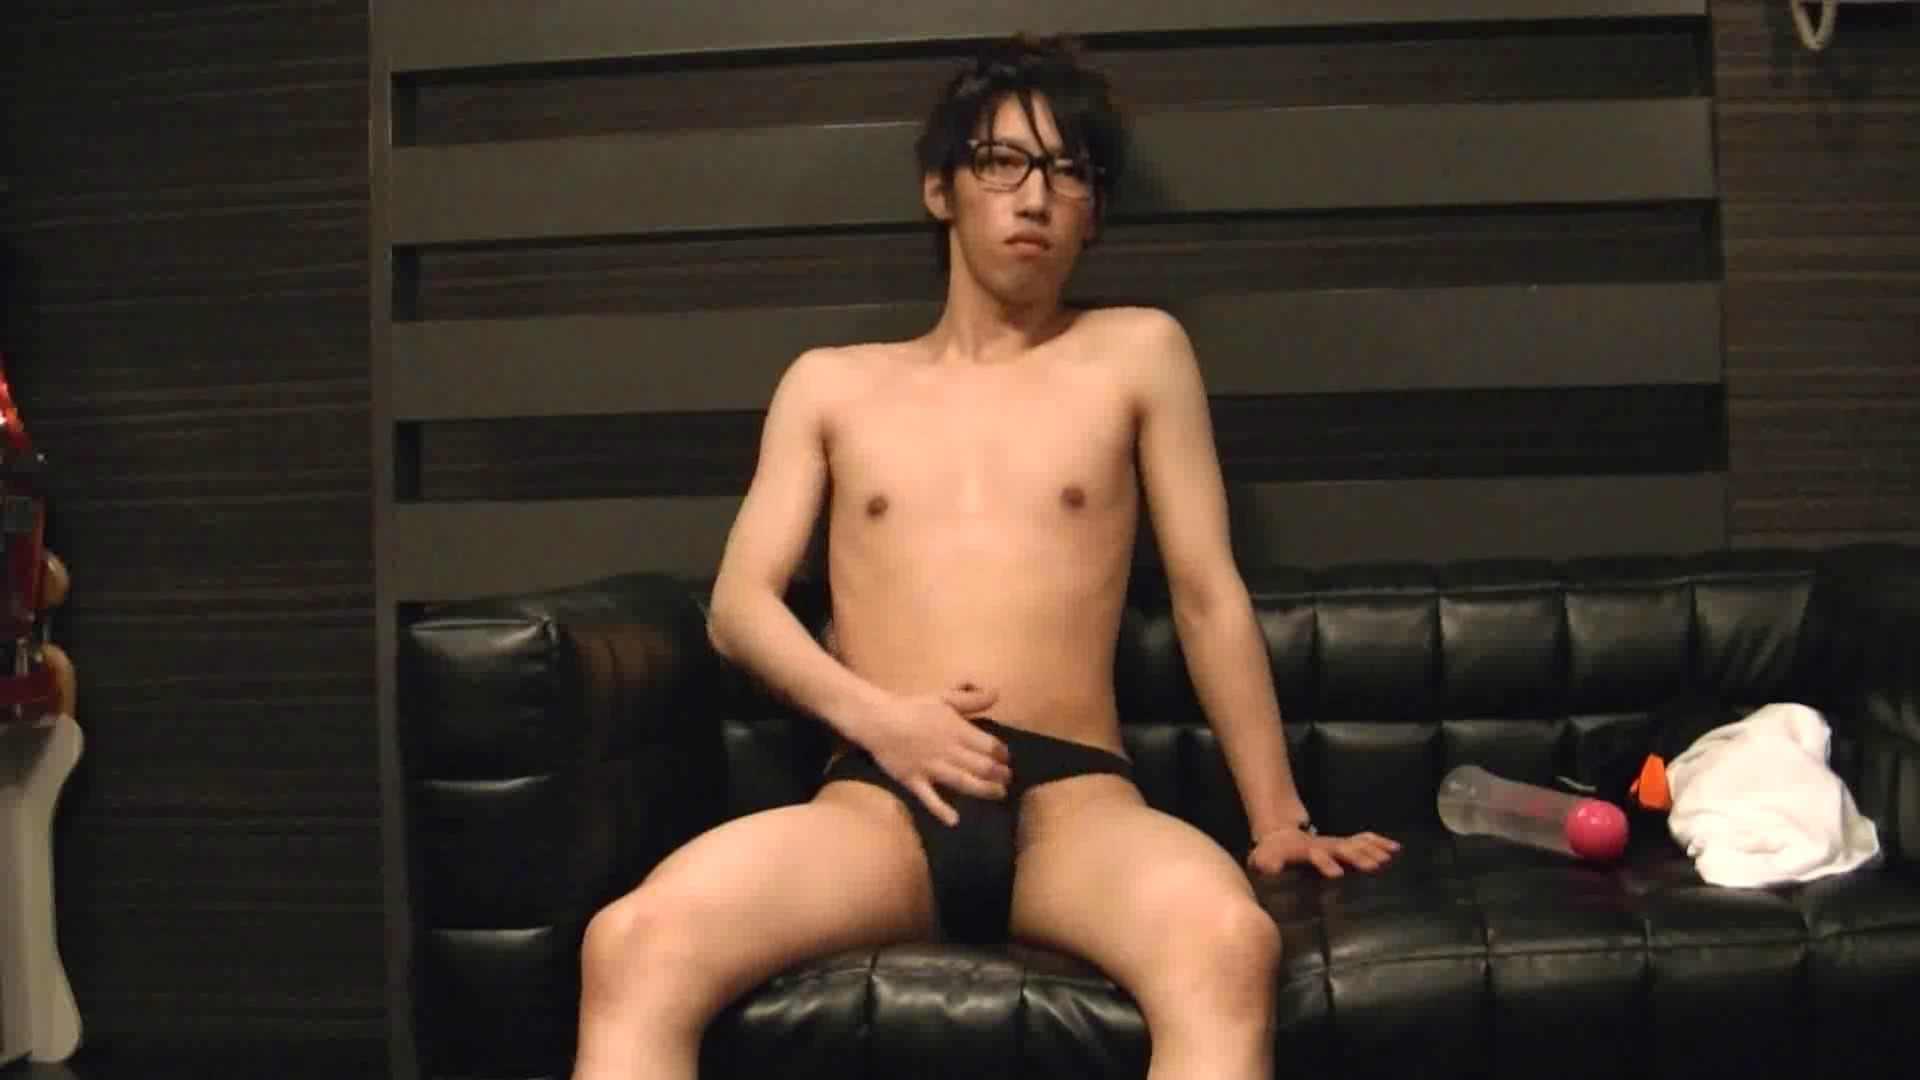 ONA見せカーニバル!! Vol3 男 ゲイ無料無修正画像 89枚 21